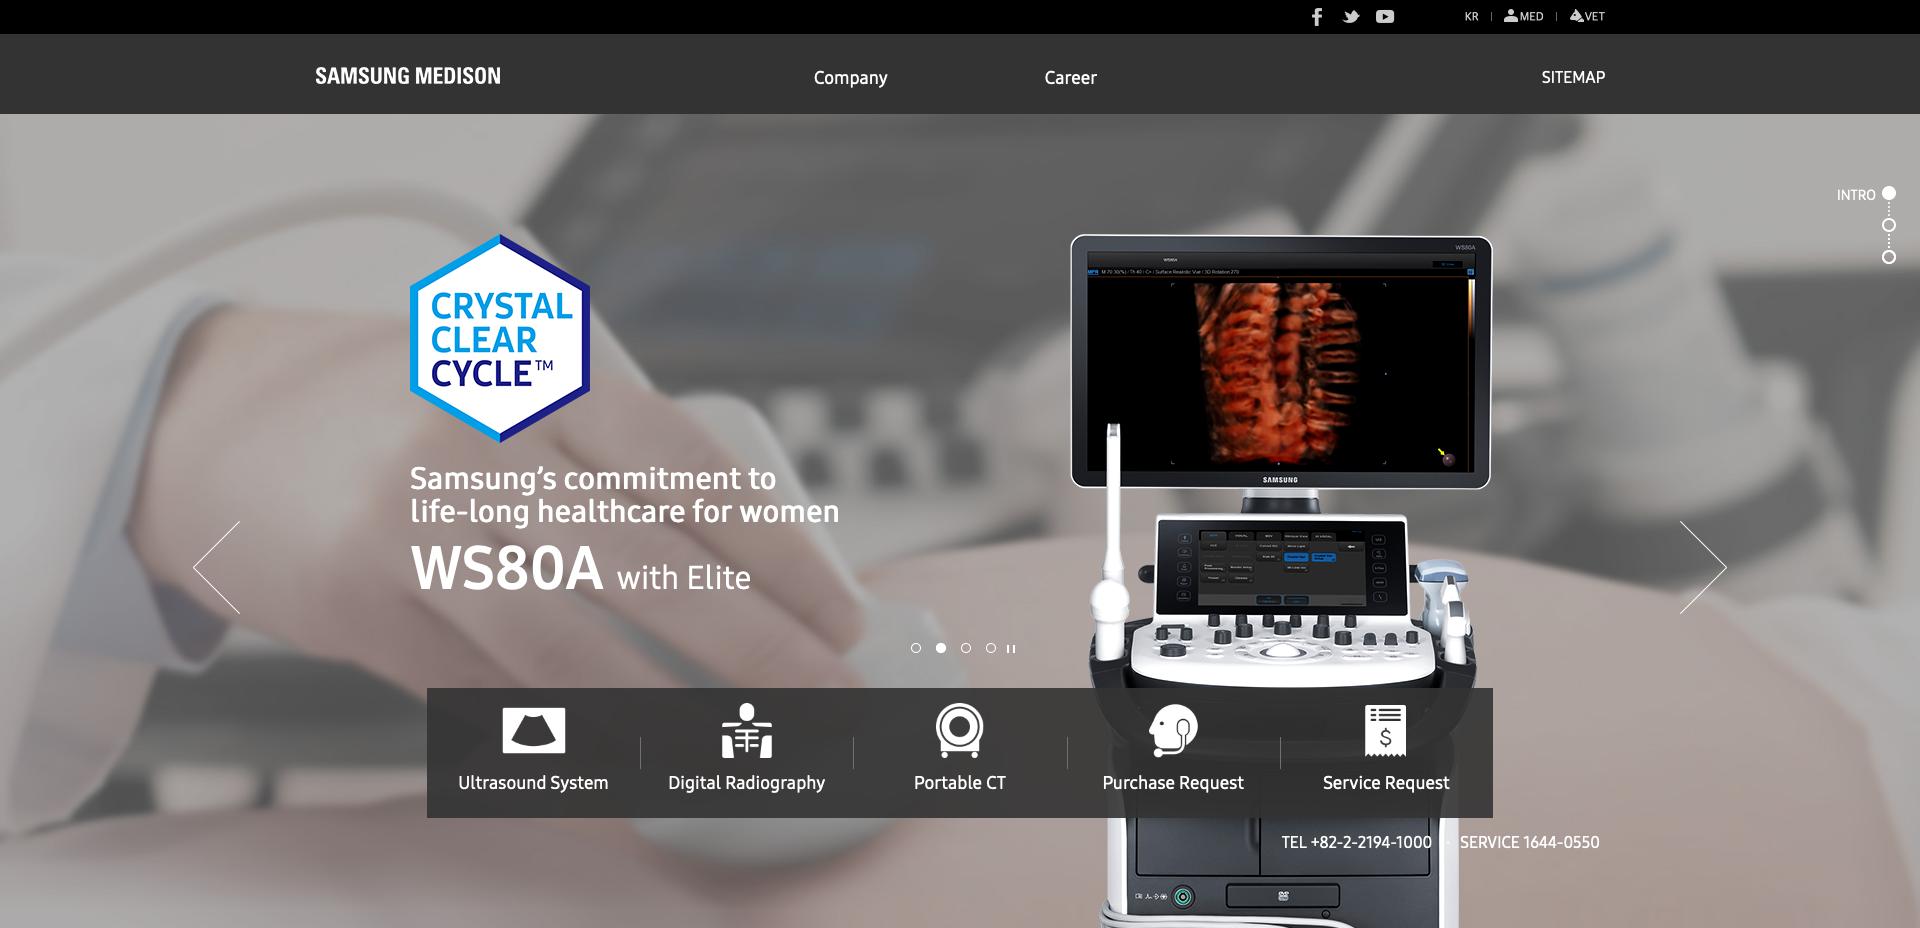 Samsung Medison Homepage